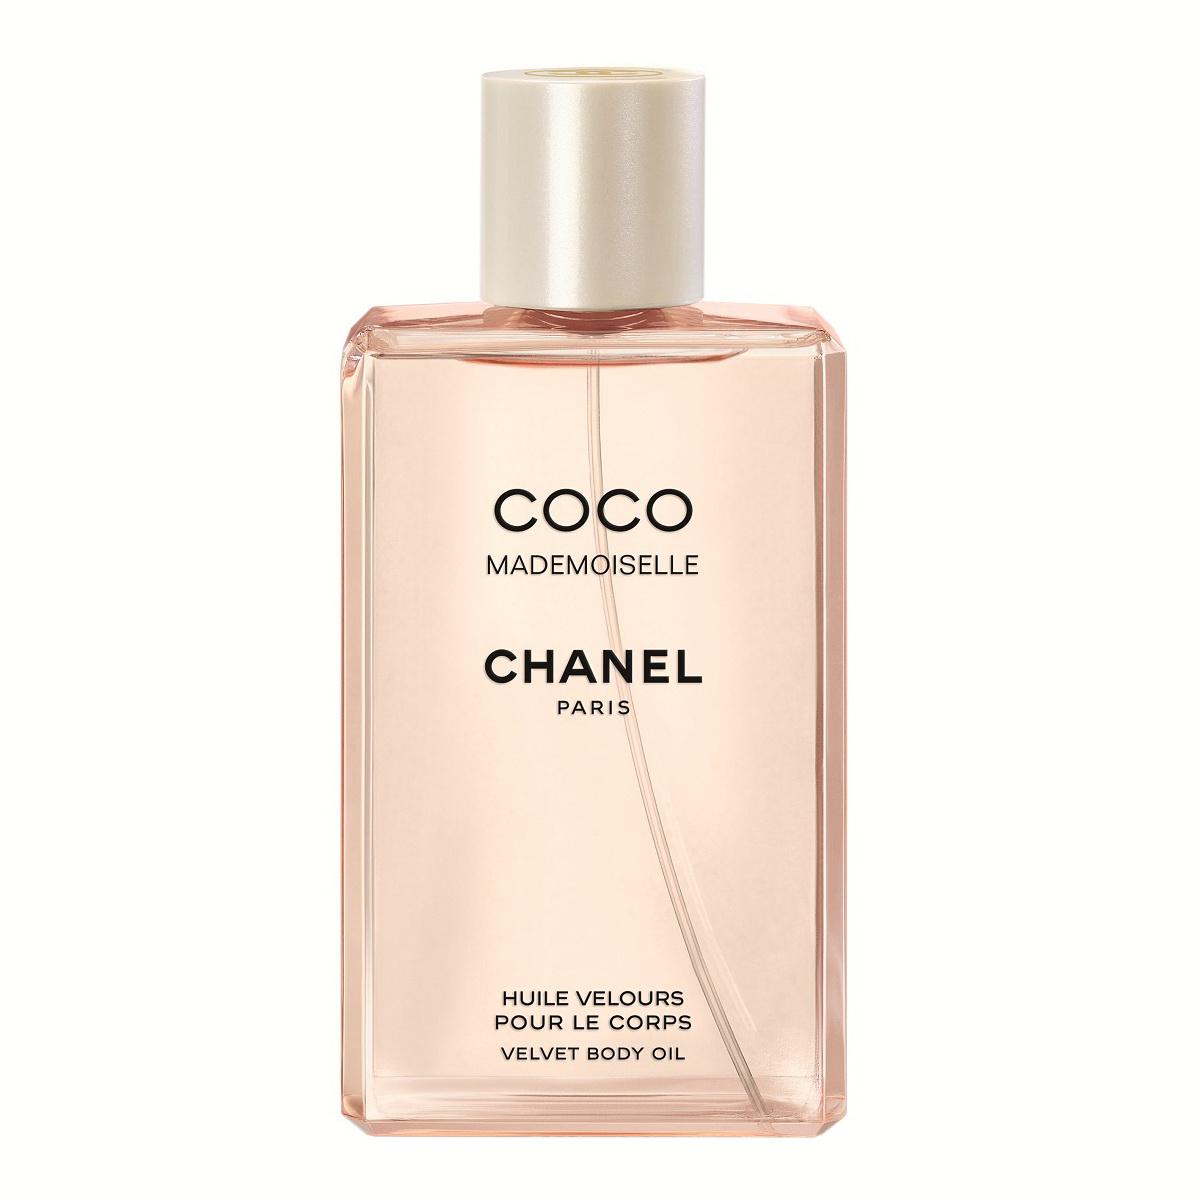 Chanel Coco Mademoiselle Velvet Body Oil Fashionela